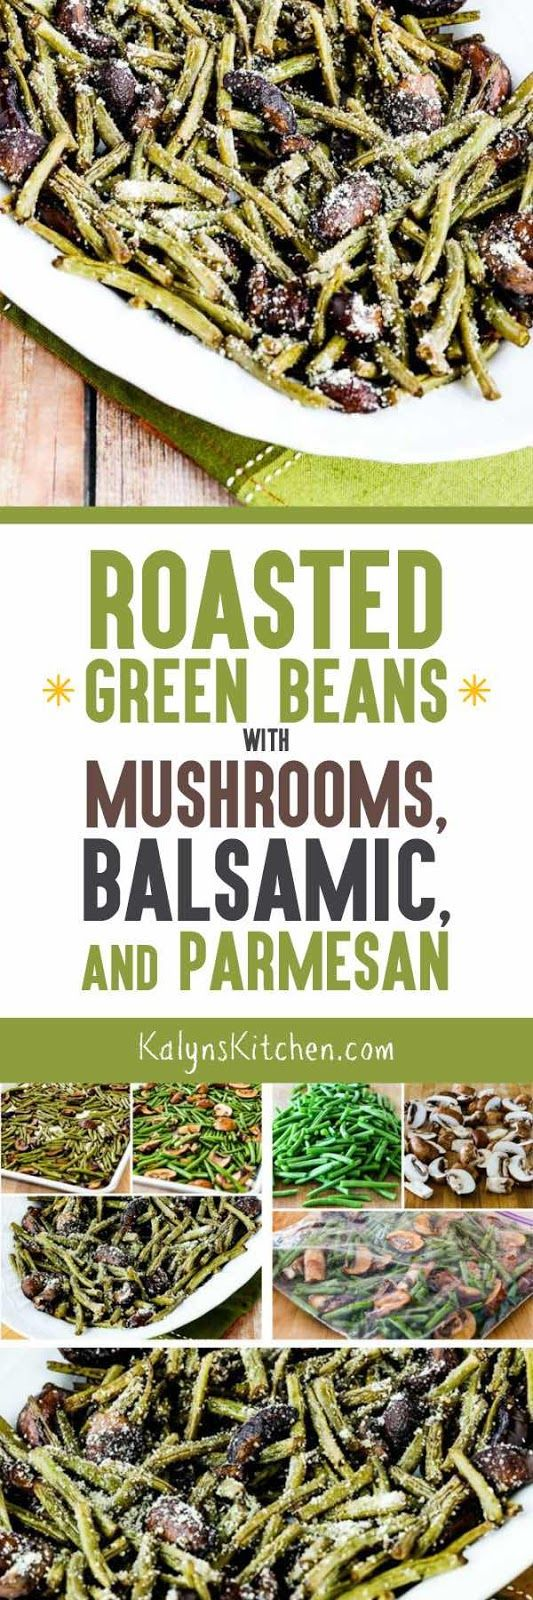 25+ best ideas about Amazing Greens on Pinterest | Veggies ...